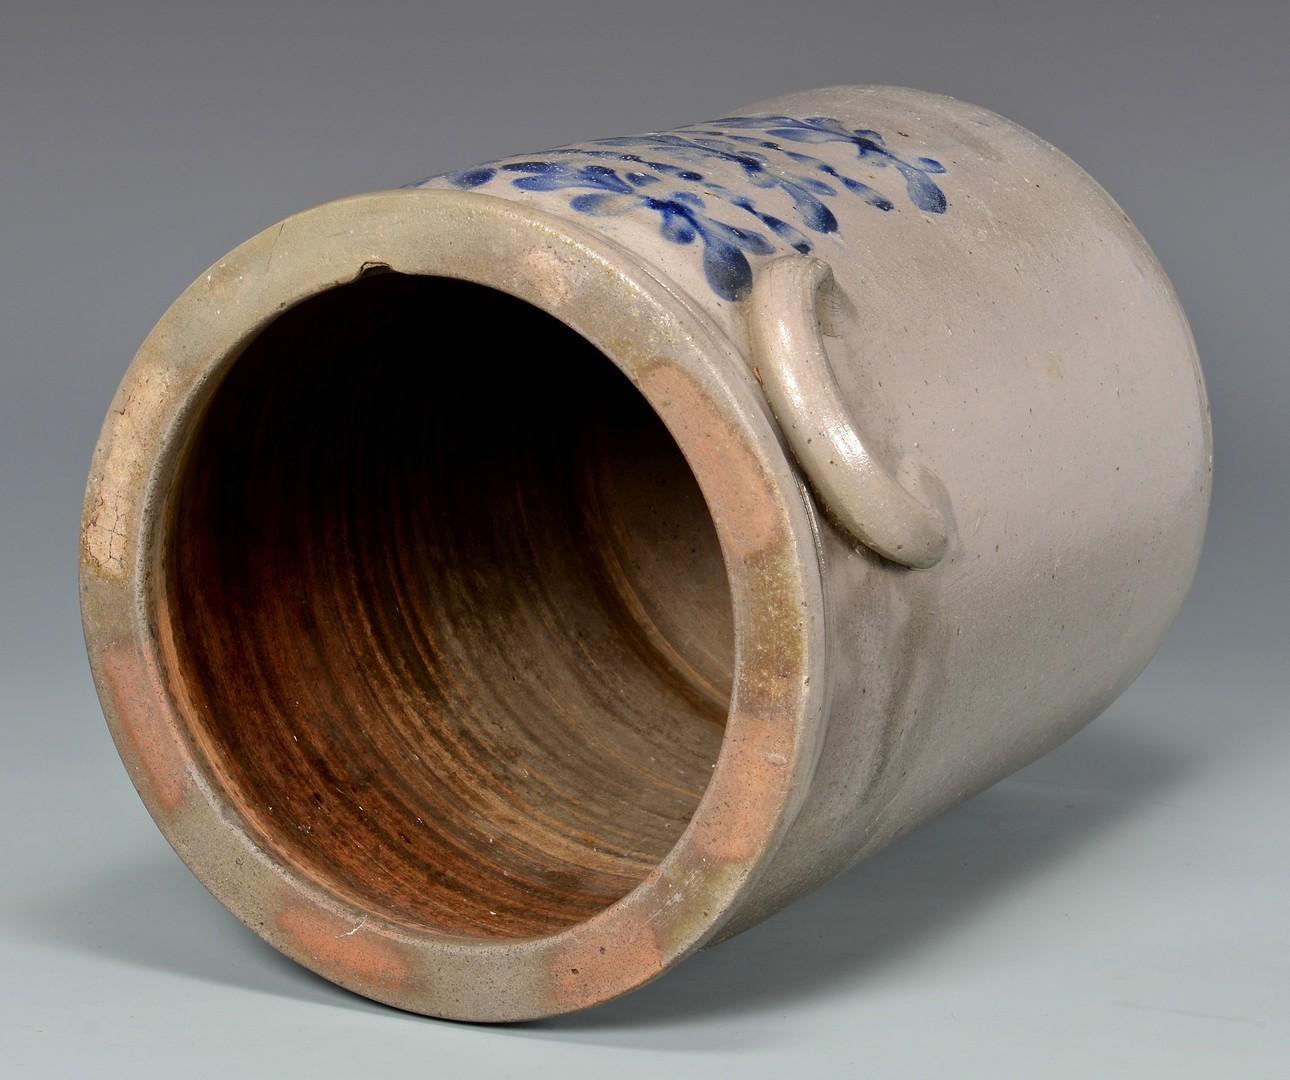 Lot 143: KY Cobalt Decorated Jar attrib. J. H. Miller